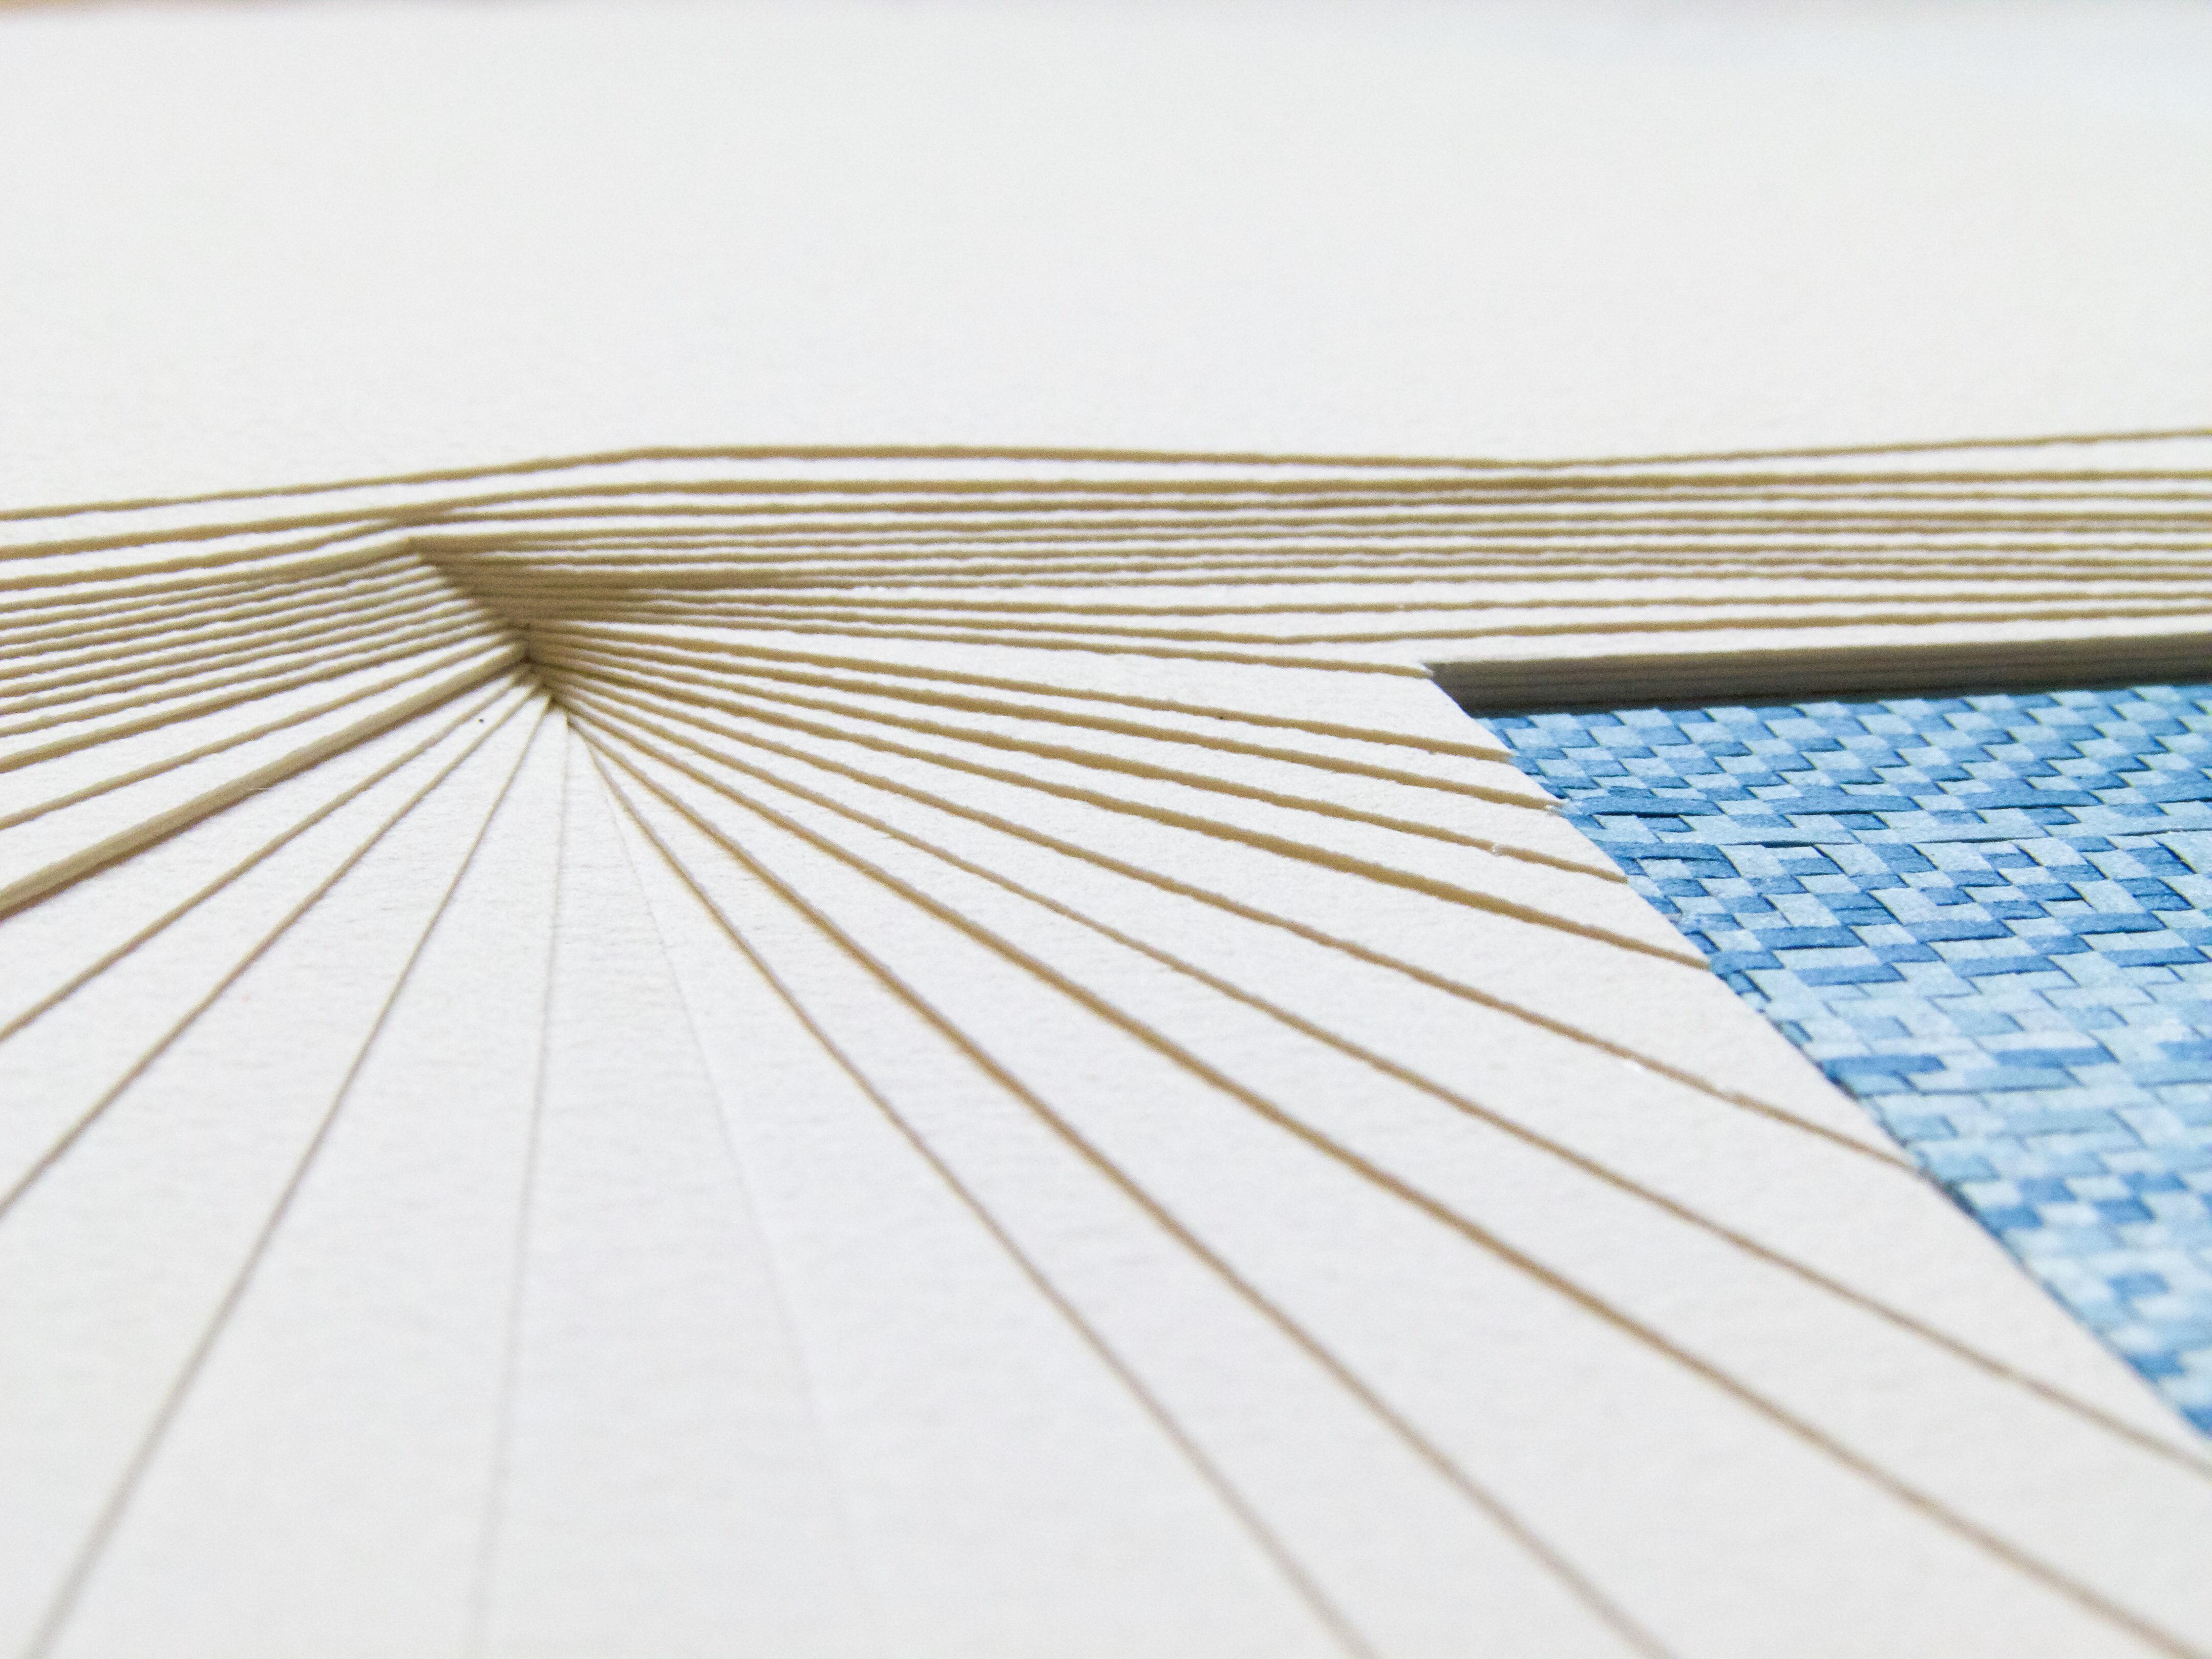 Cheng_Jacky_Water_1.3.2020_Bas Relief Paper sculpture_g